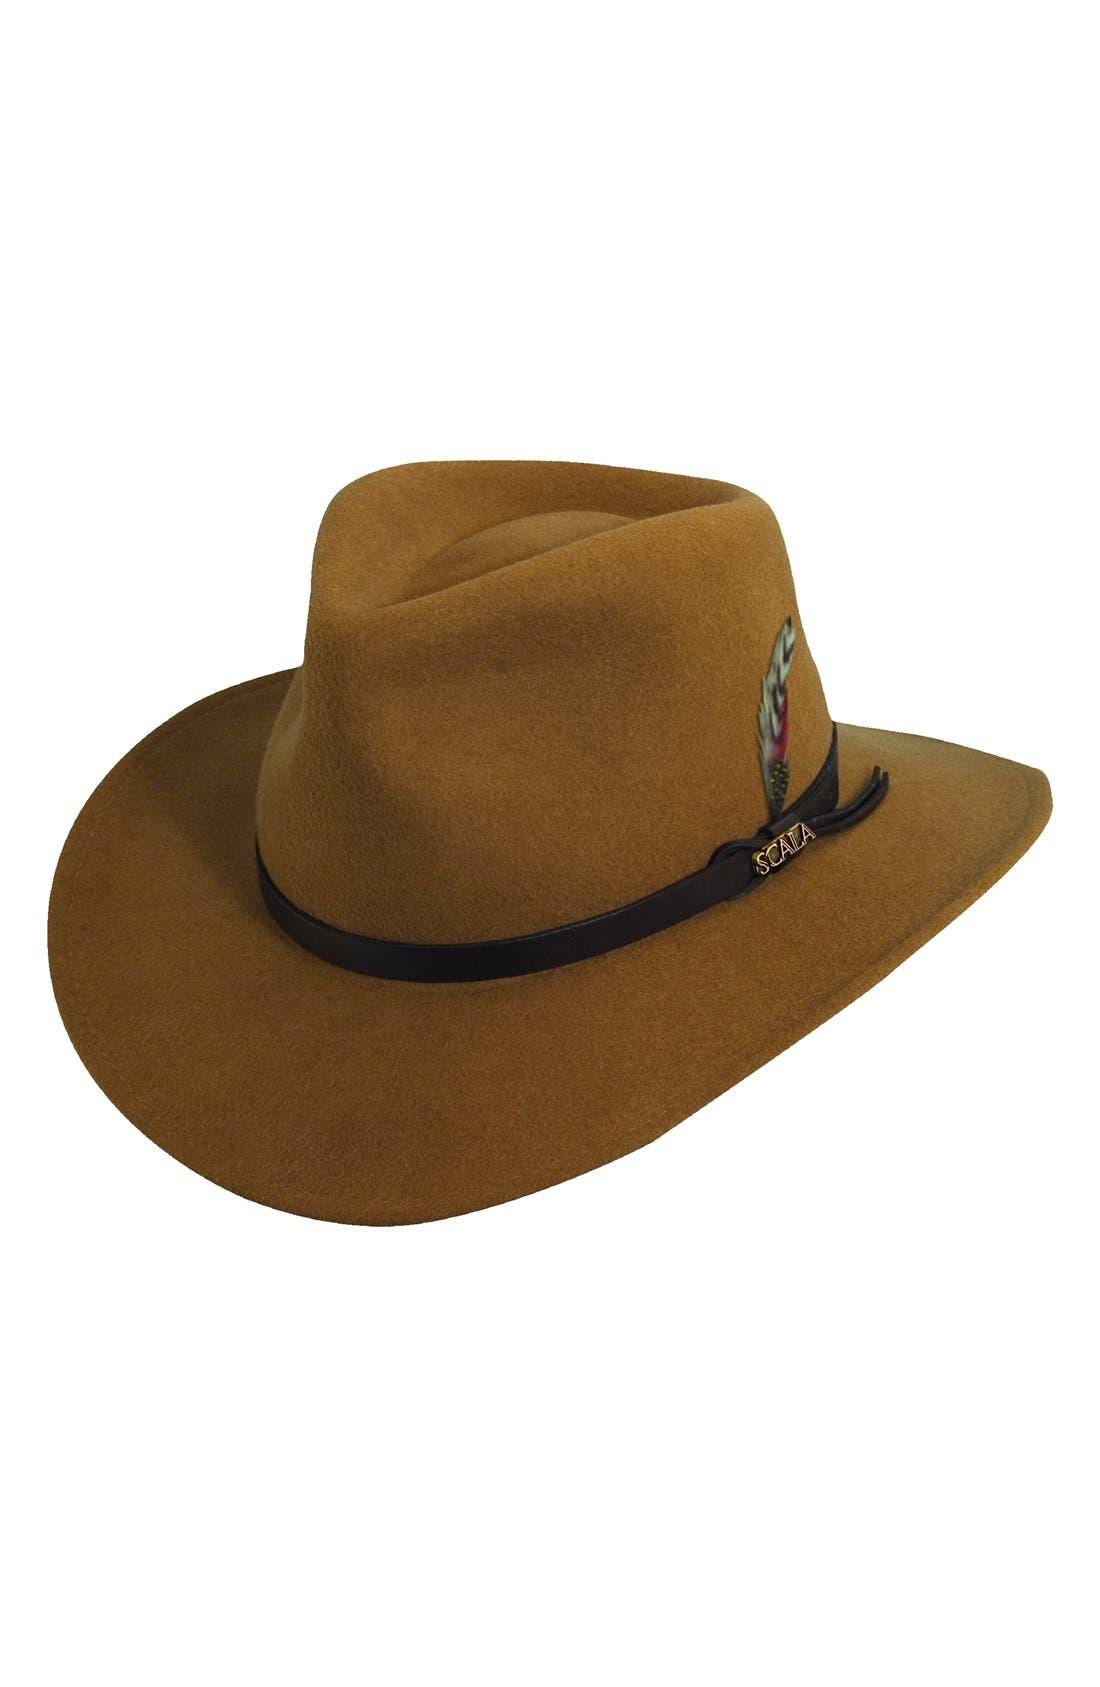 Scala 'Classico' Crushable Felt Outback Hat